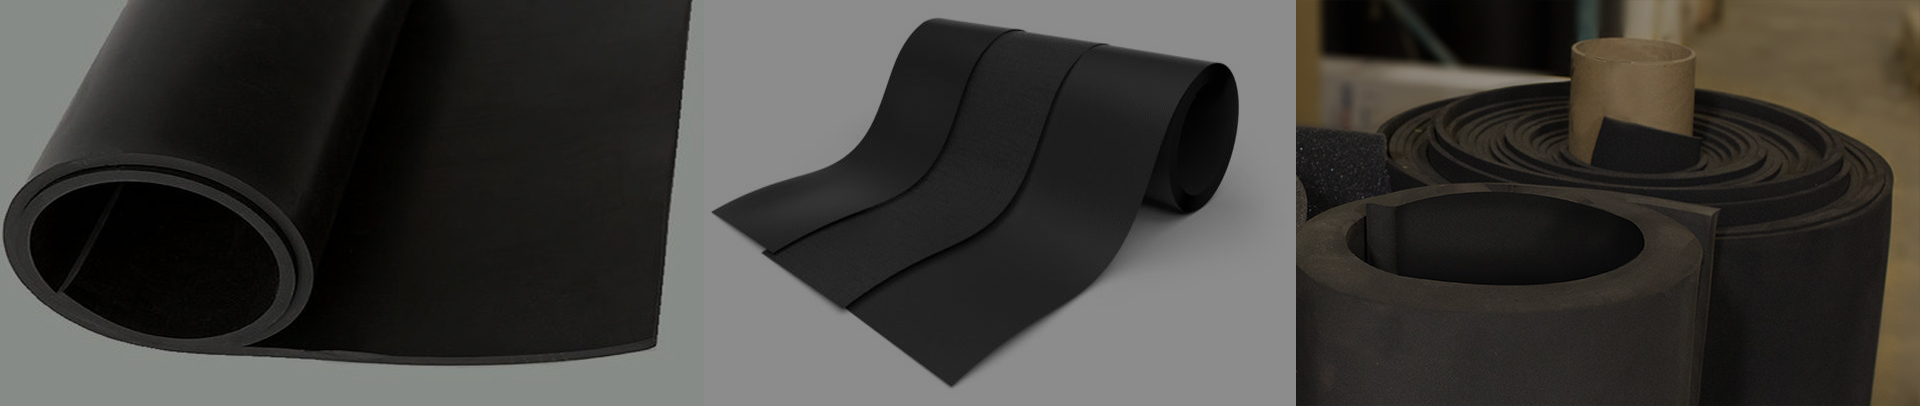 Nylon Cloth Insertion Rubber Sheet Manufacturers India, USA, UK